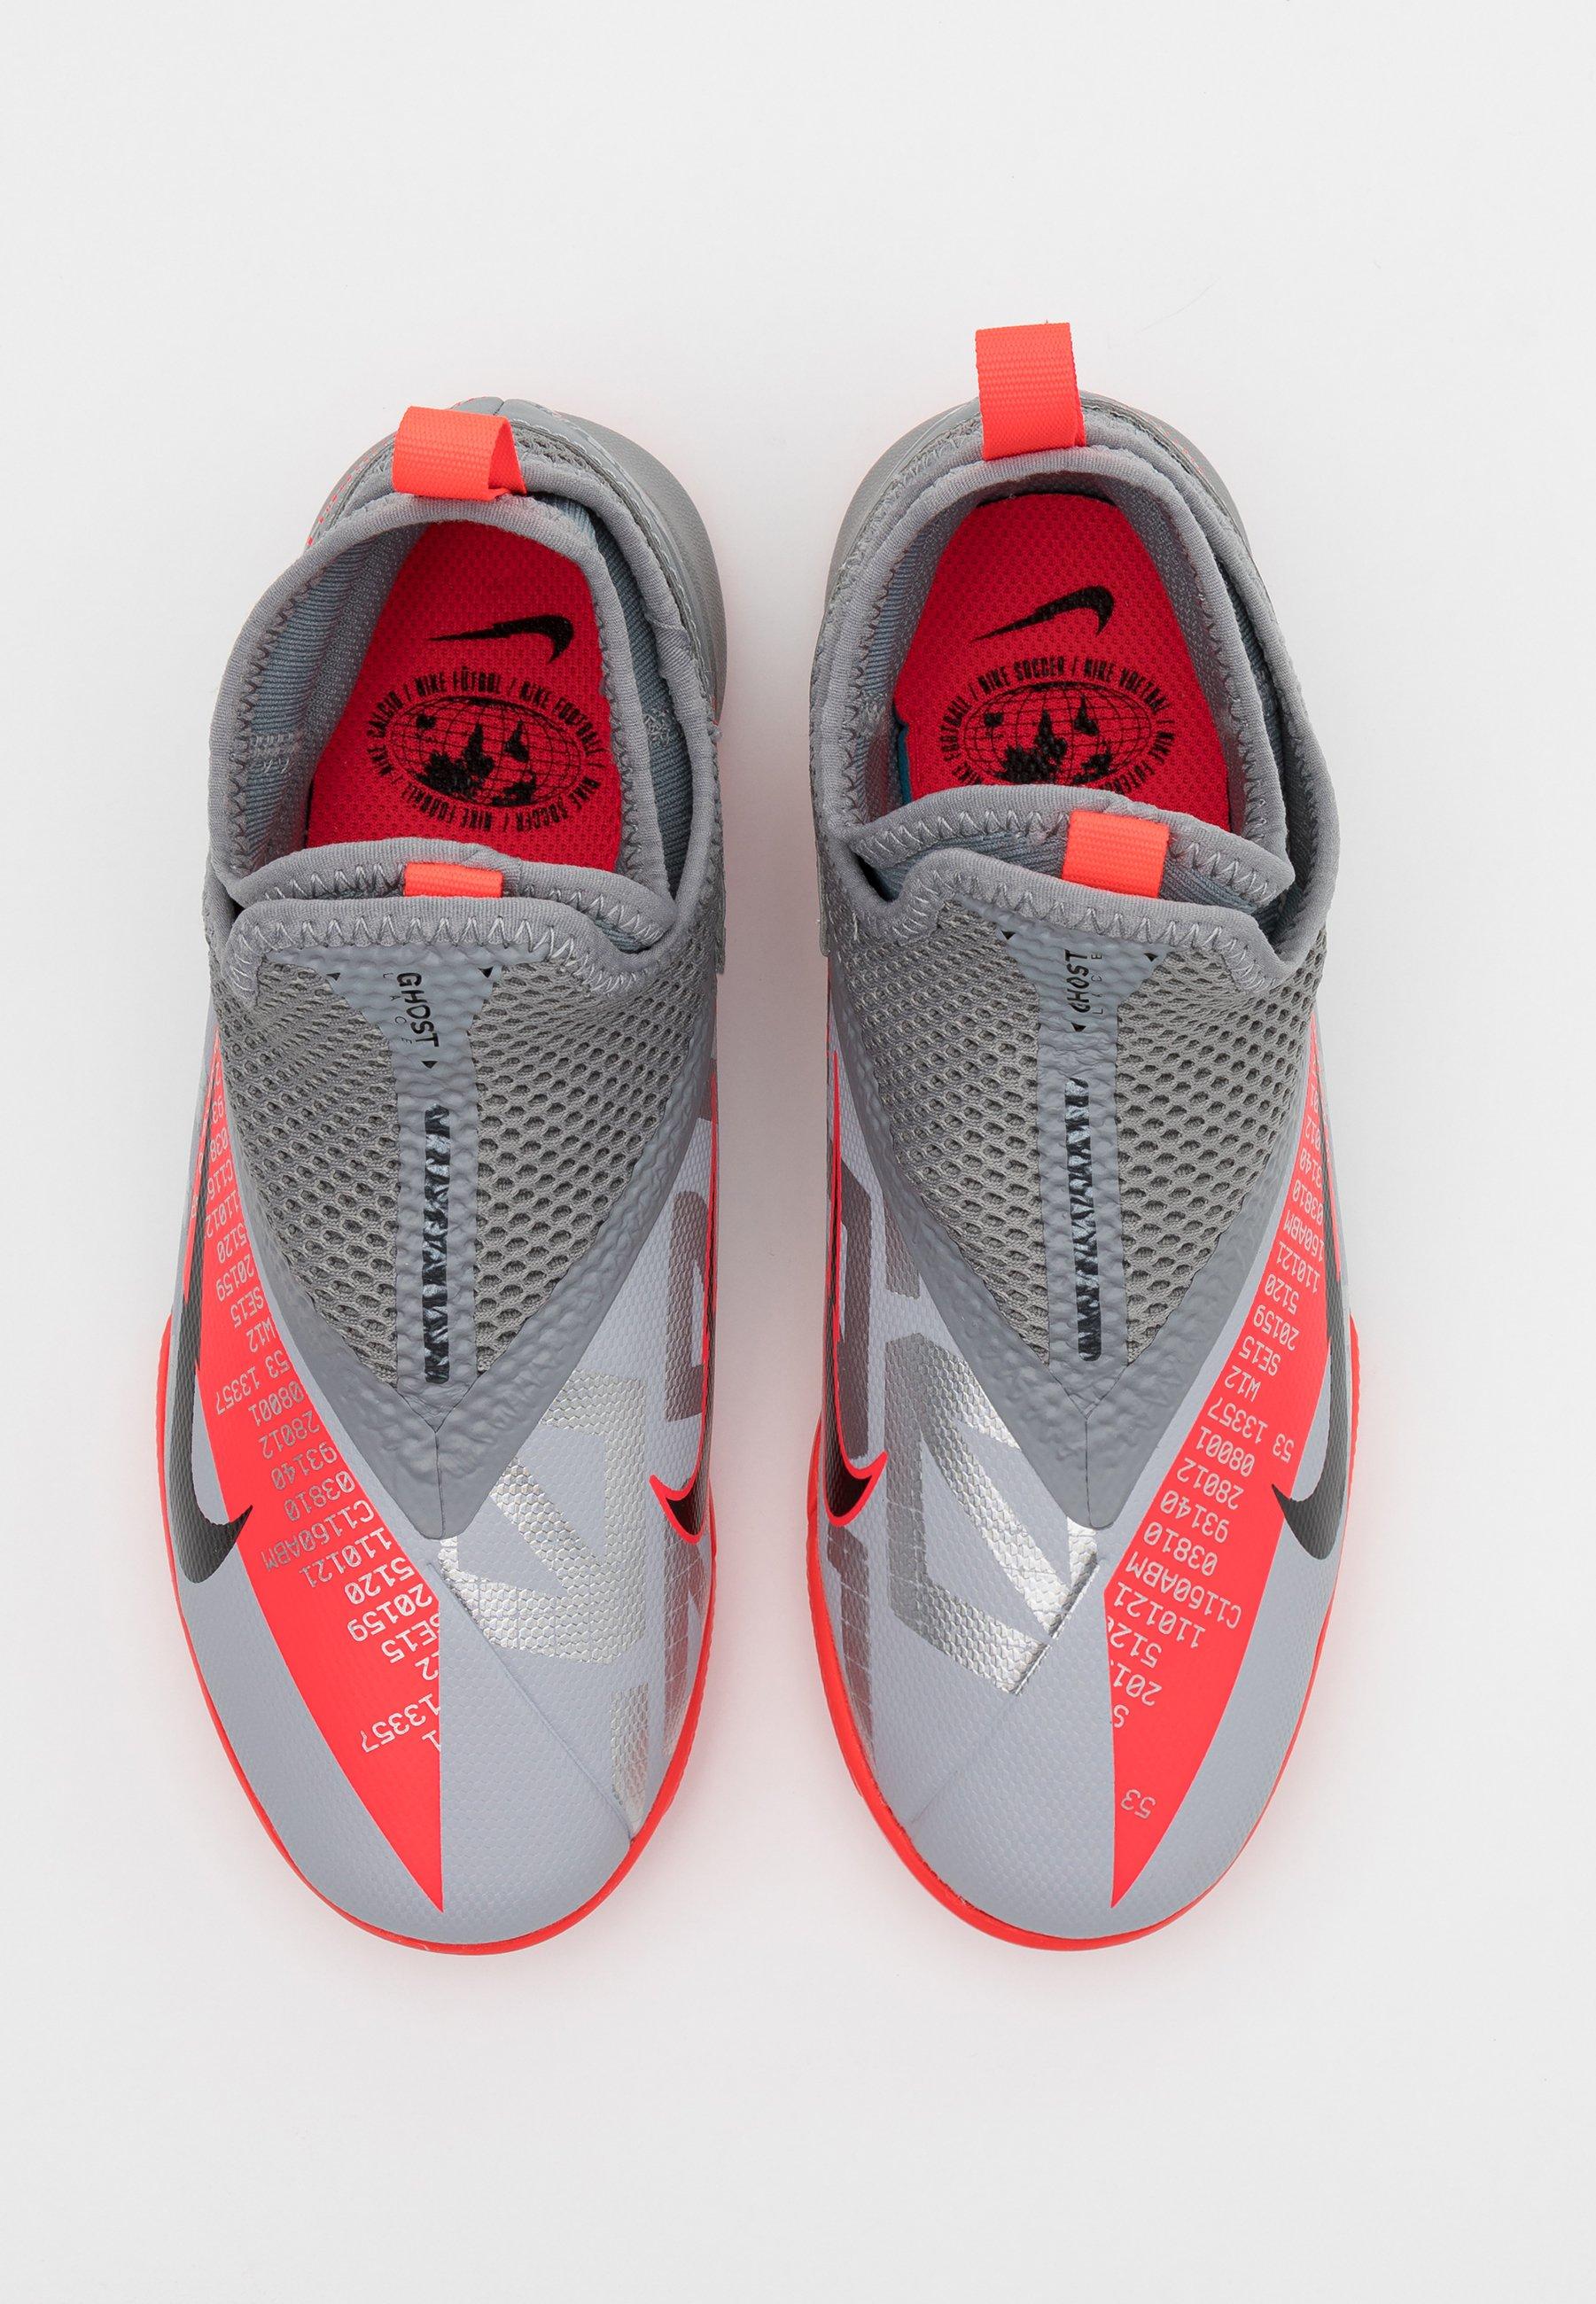 PHANTOM VISION 2 ACADEMY DF IC Chaussures de foot en salle metallic bomber greyblackparticle grey